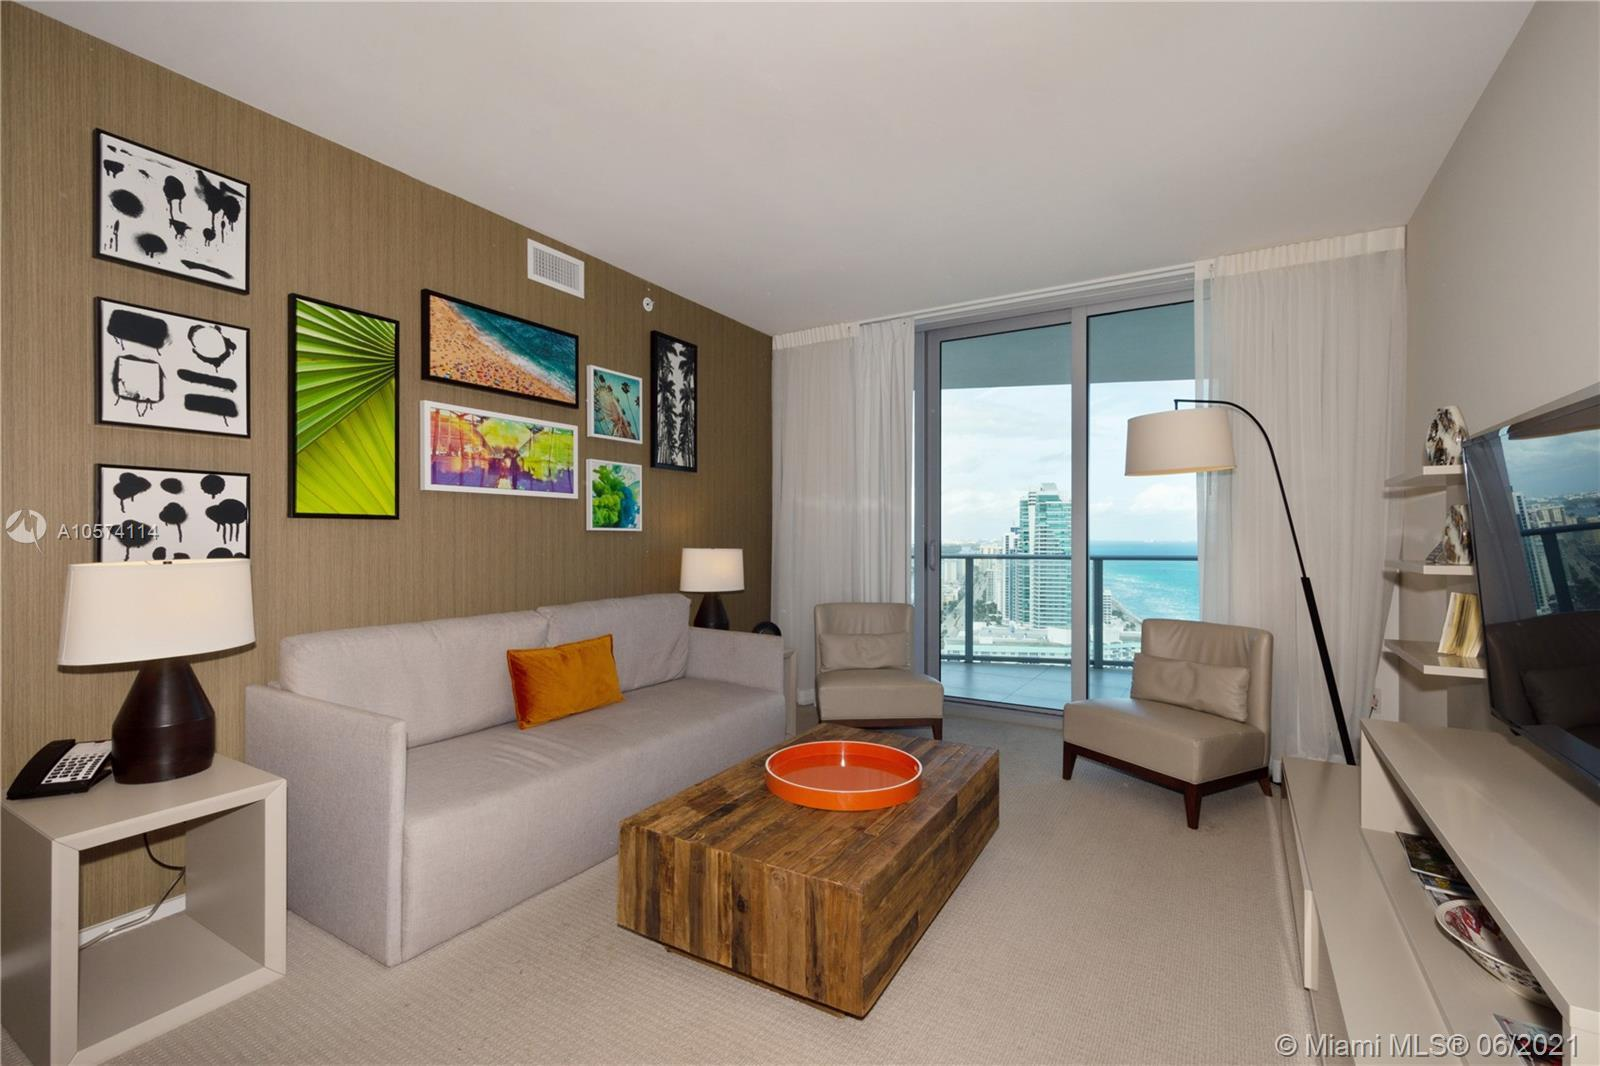 Prestige Hyde Resort and Residences Condo 2/2 in Hollywood Beach. Beautiful views of the ocean, pool